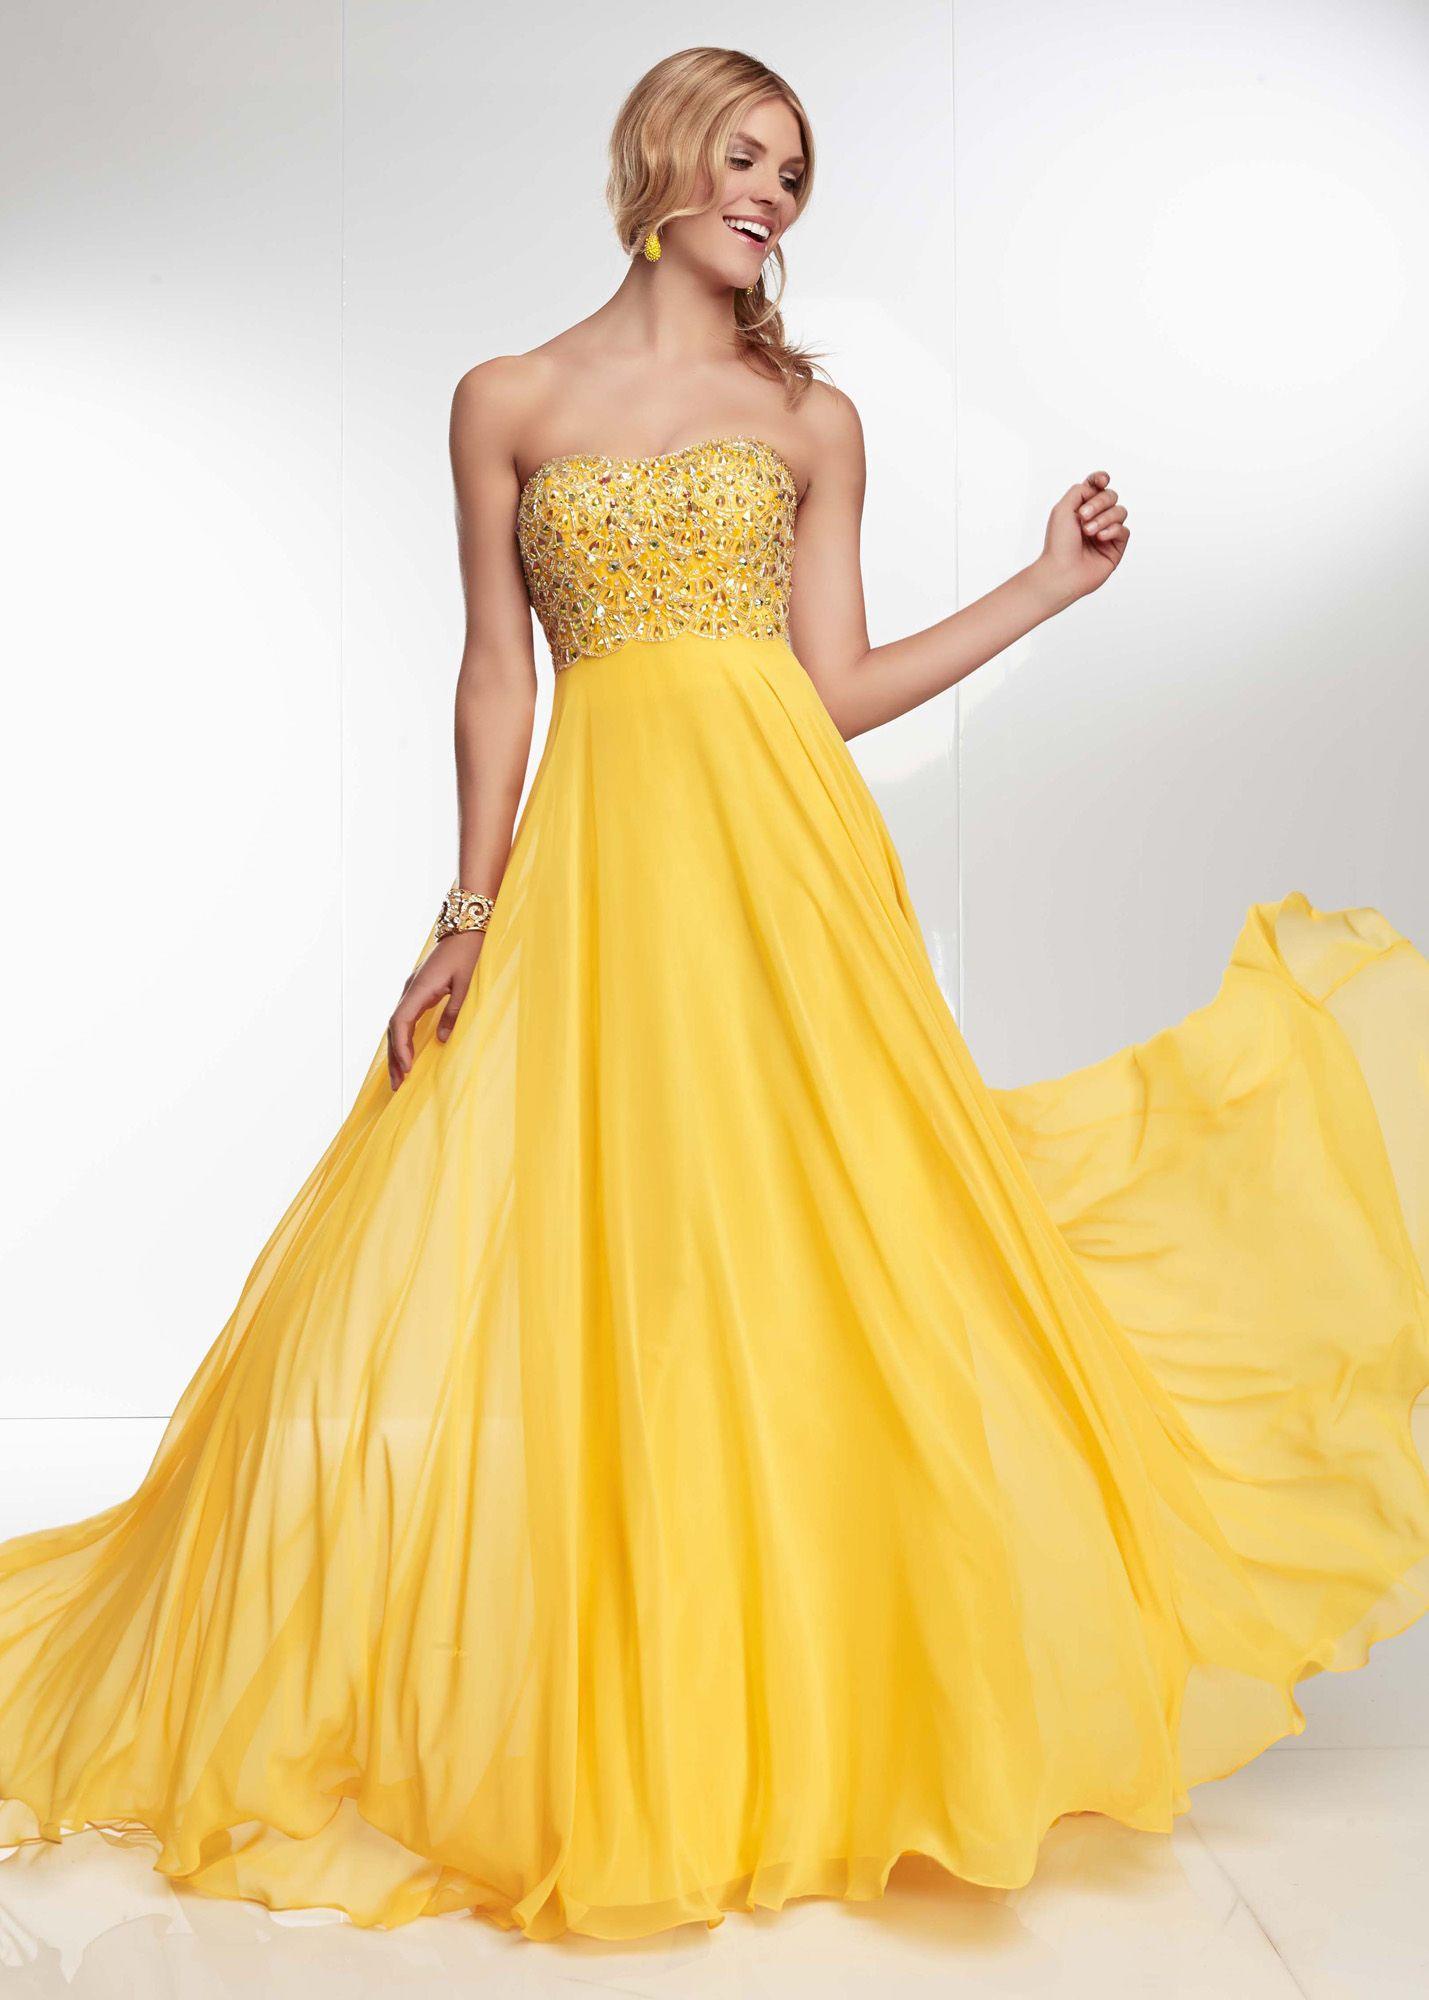 Pretty yellow dress elegant prom dresses pinterest yellow